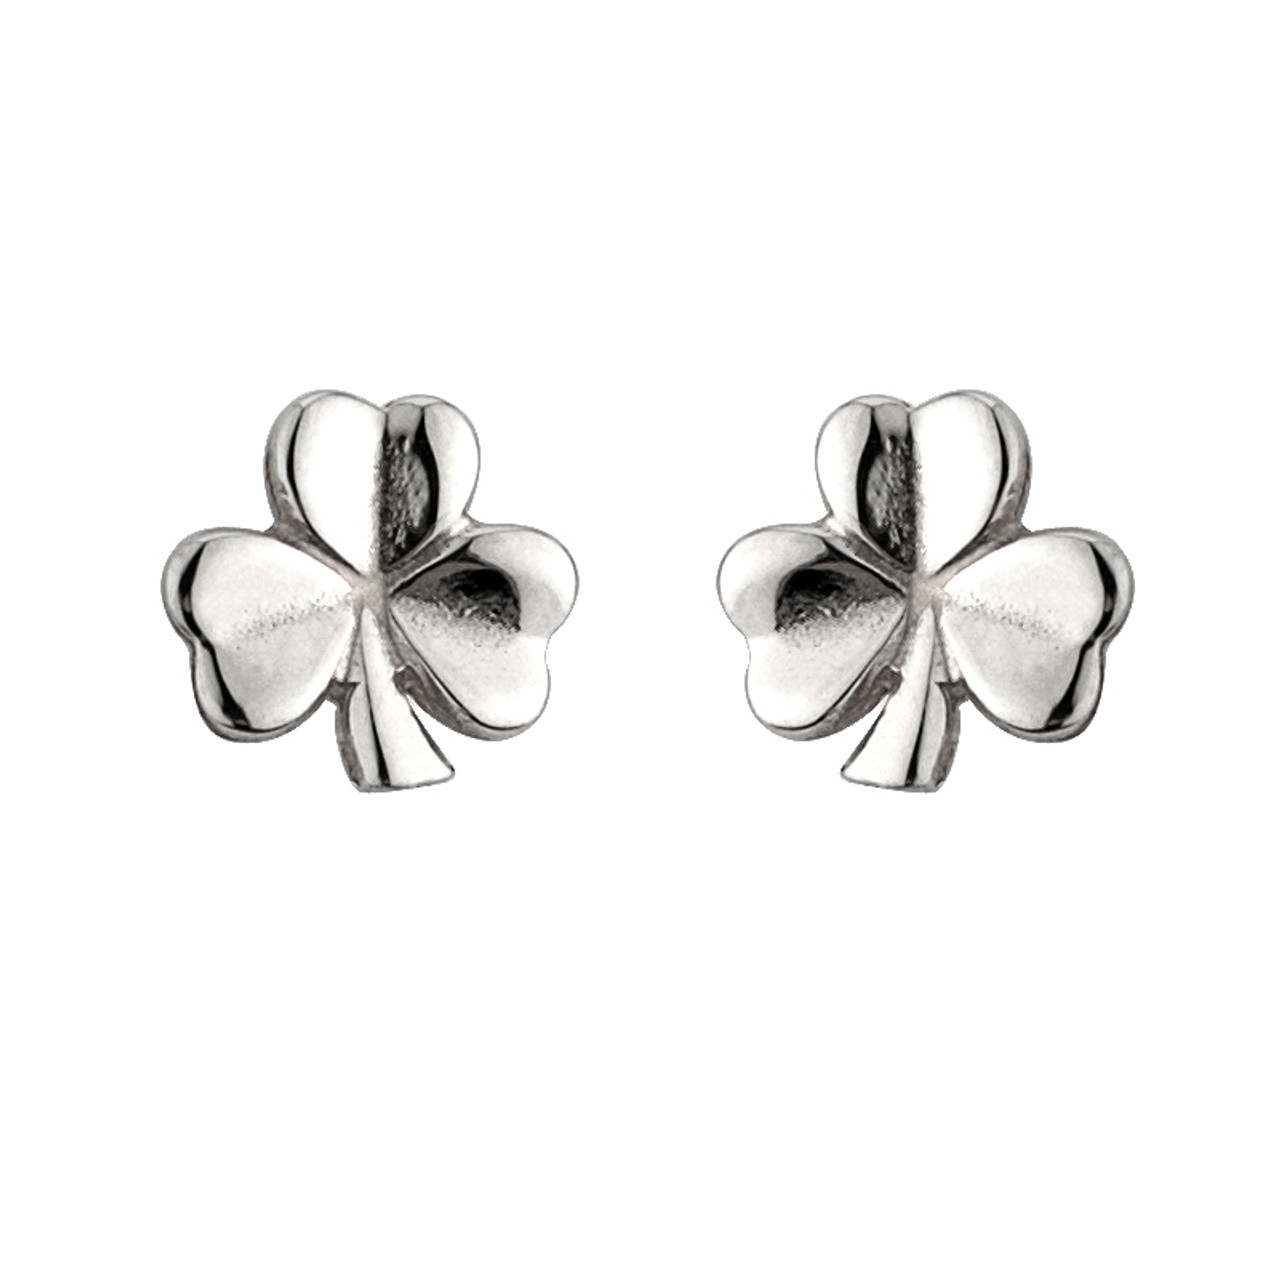 11883ad21 Sterling Silver Shiny Shamrock Stud Earrings - The Twisted Shamrock